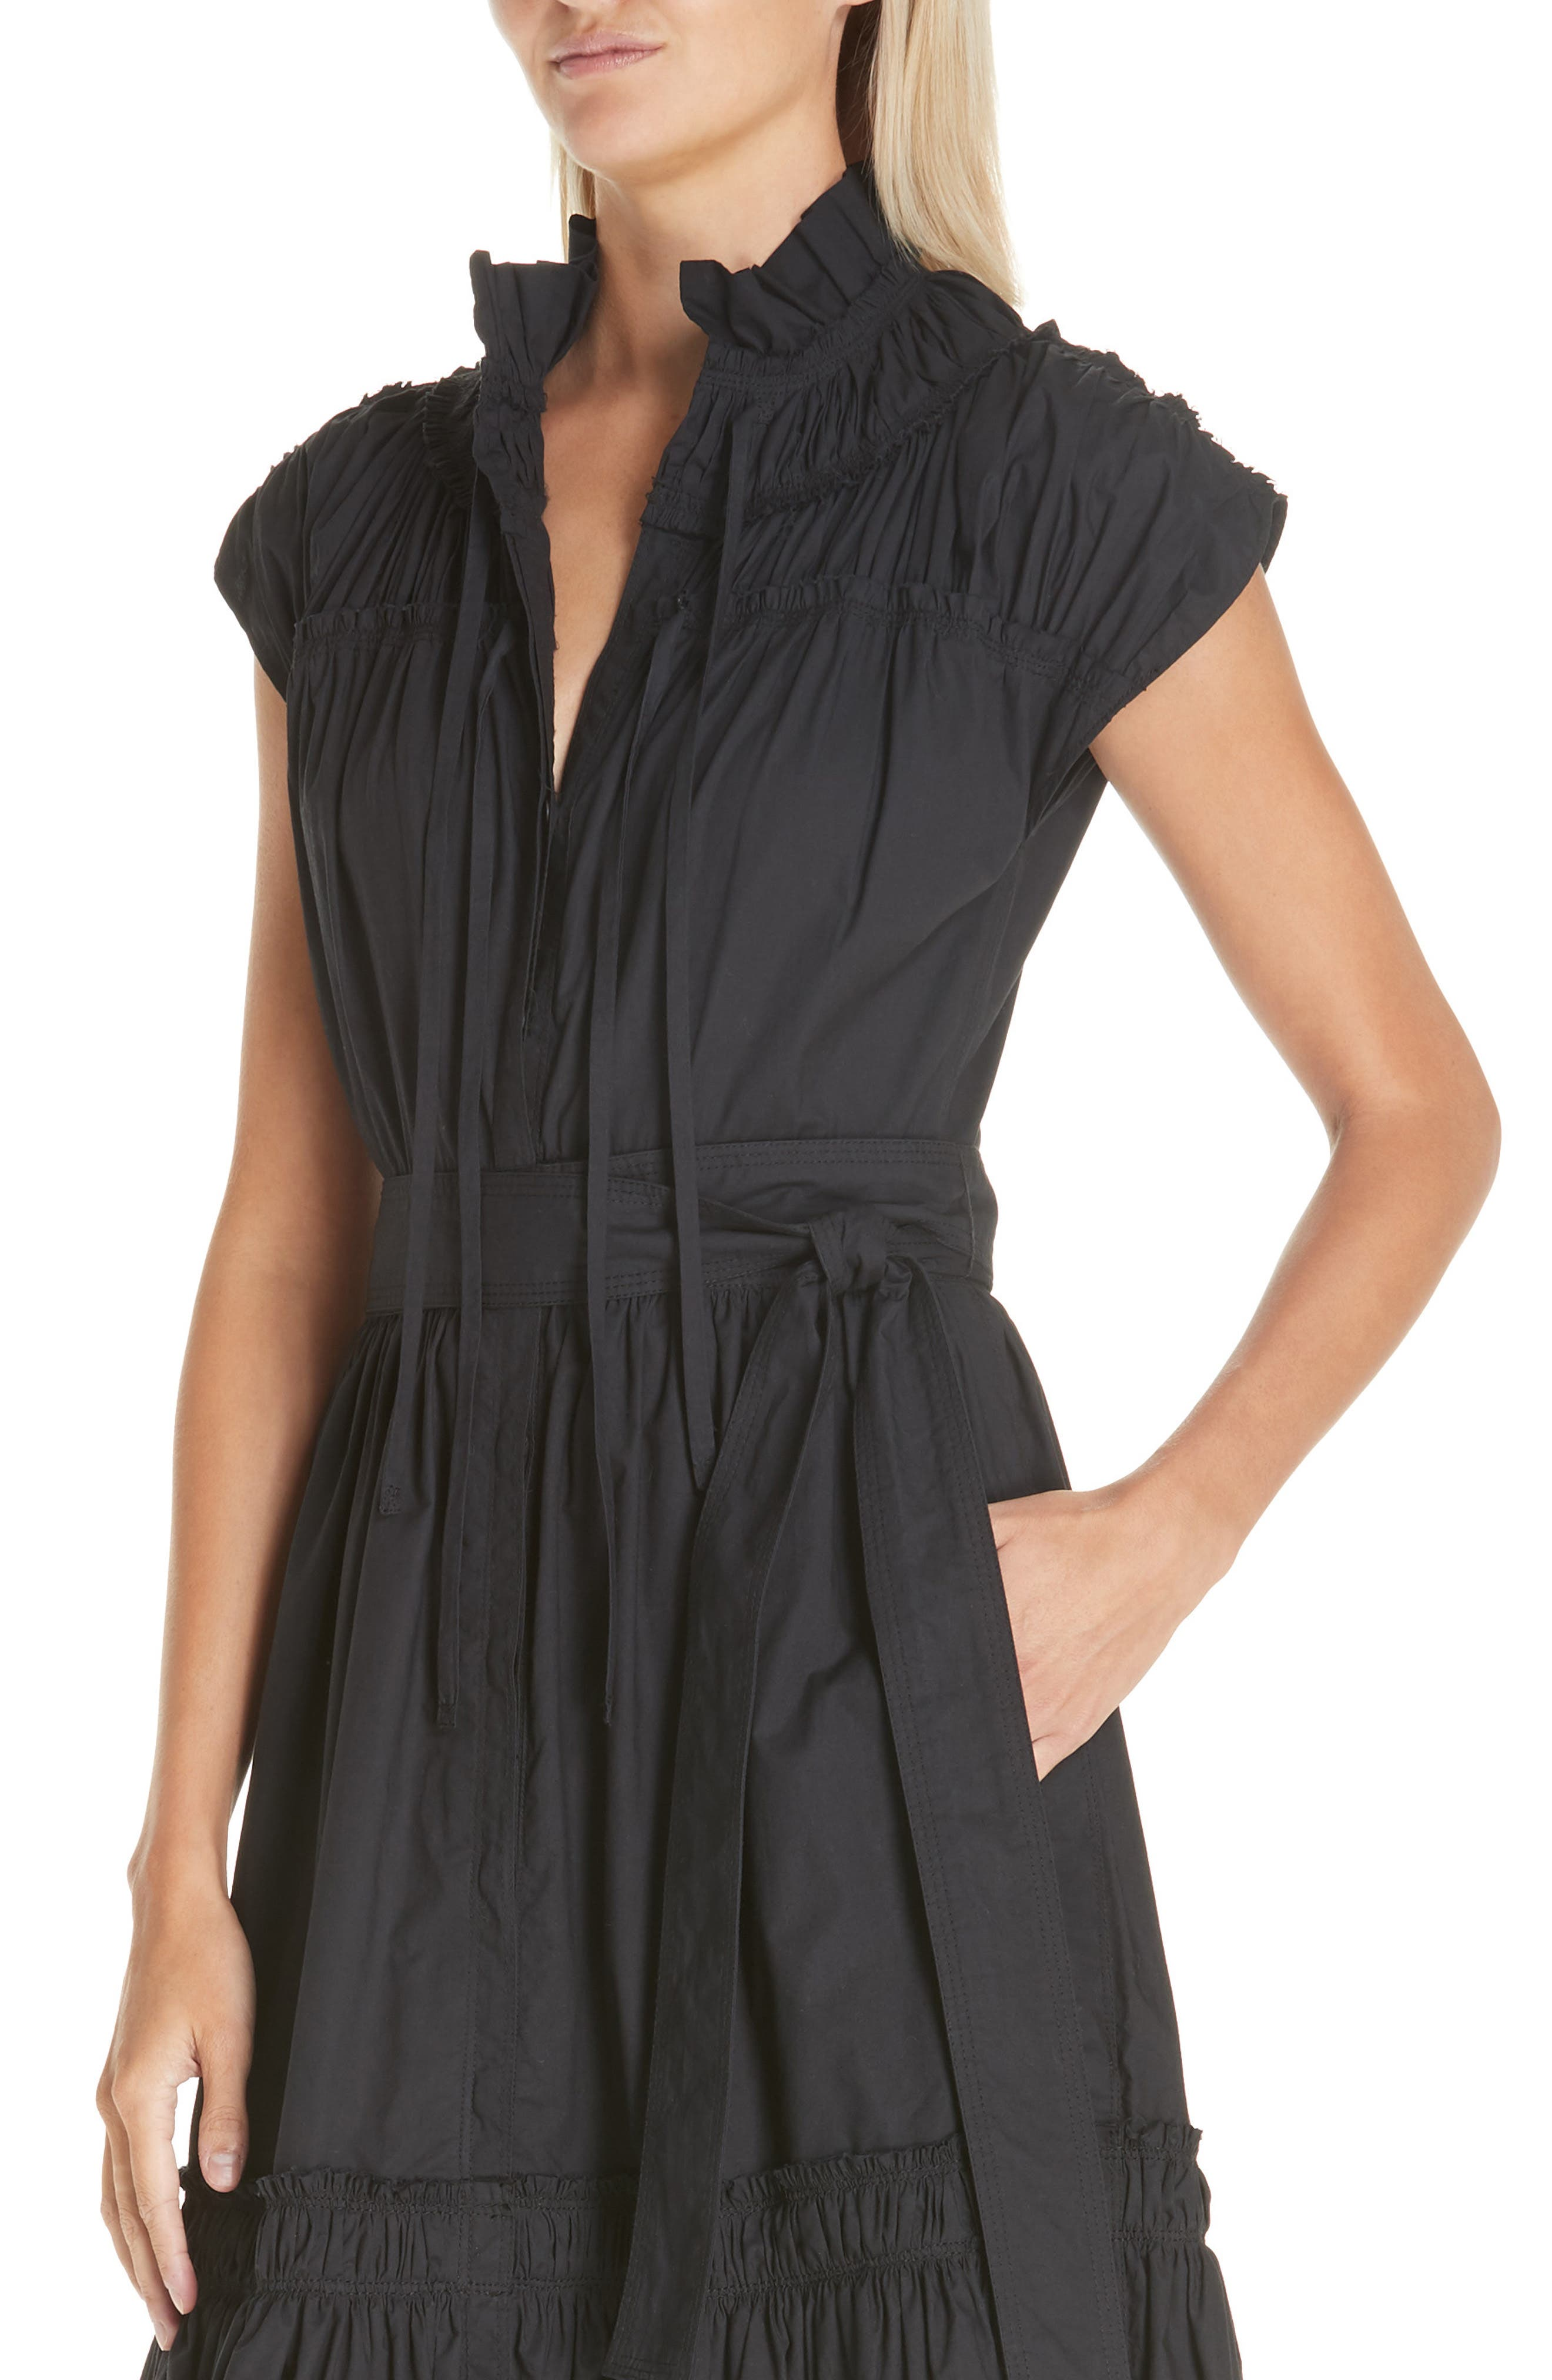 PROENZA SCHOULER, Smocked Poplin Dress, Alternate thumbnail 5, color, BLACK